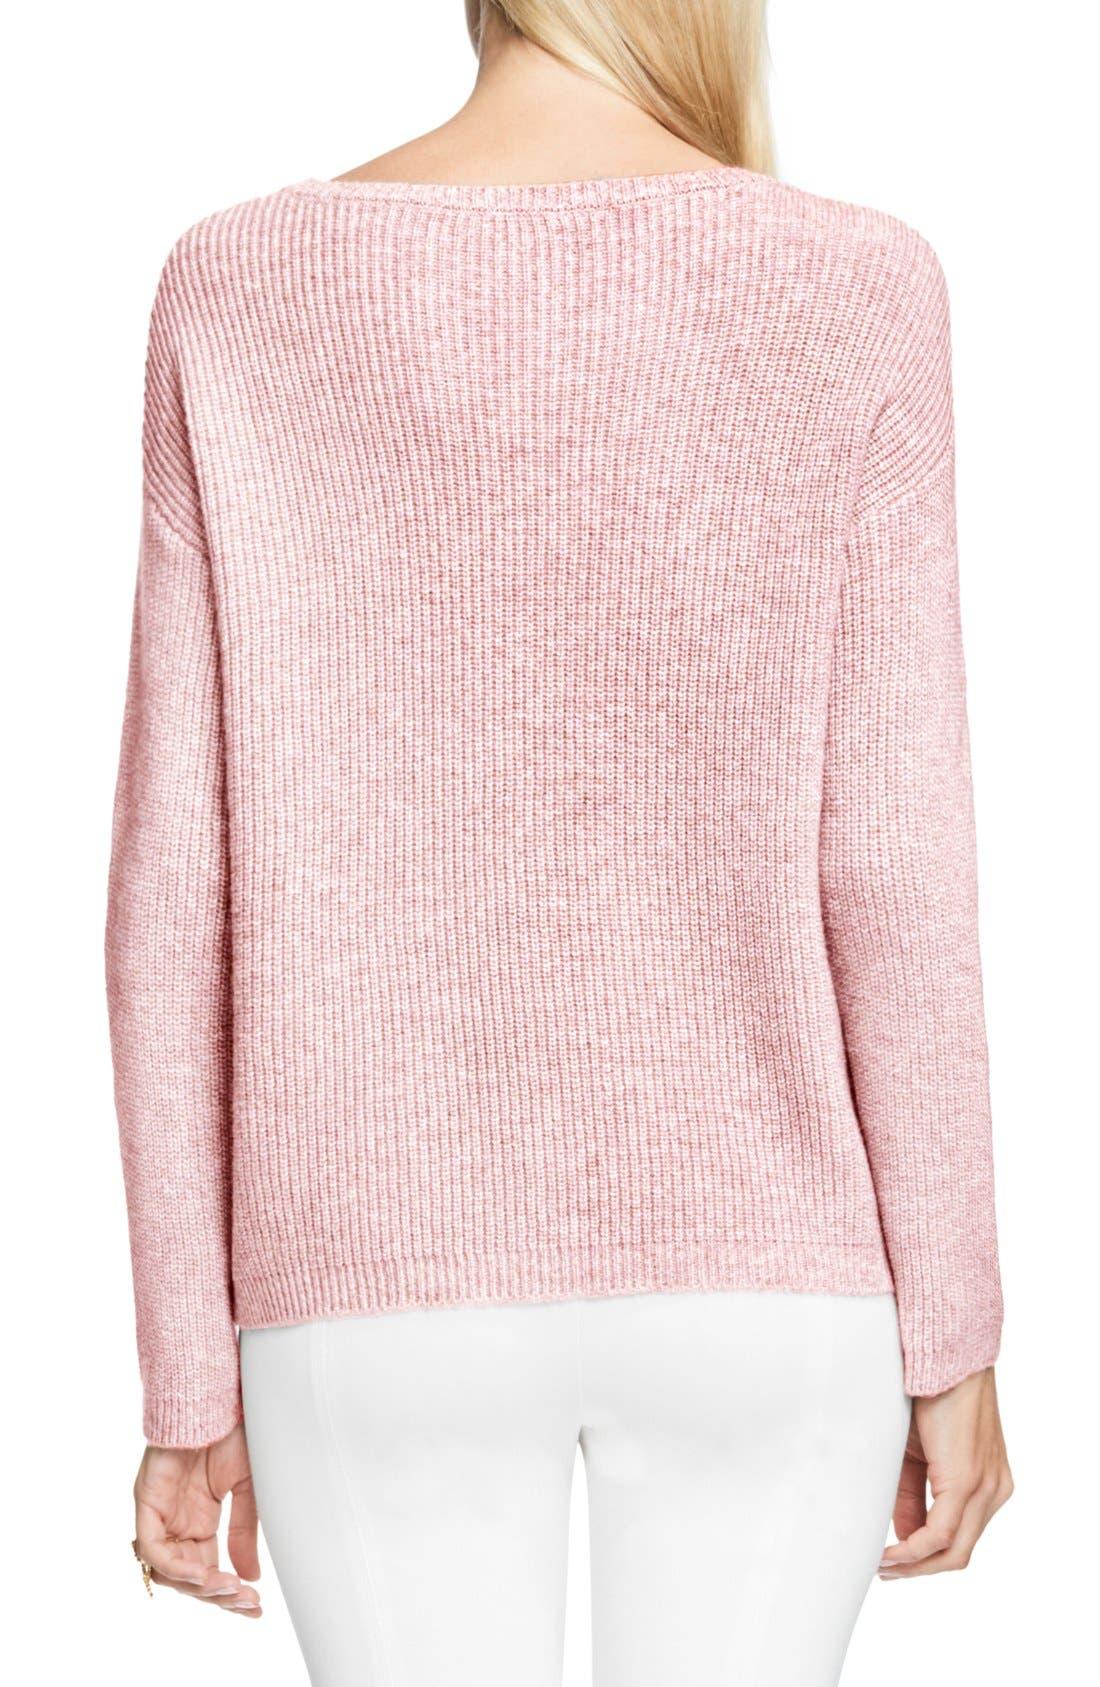 Alternate Image 2  - Vince Camuto Pointelle Yoke Sweater (Regular & Petite)